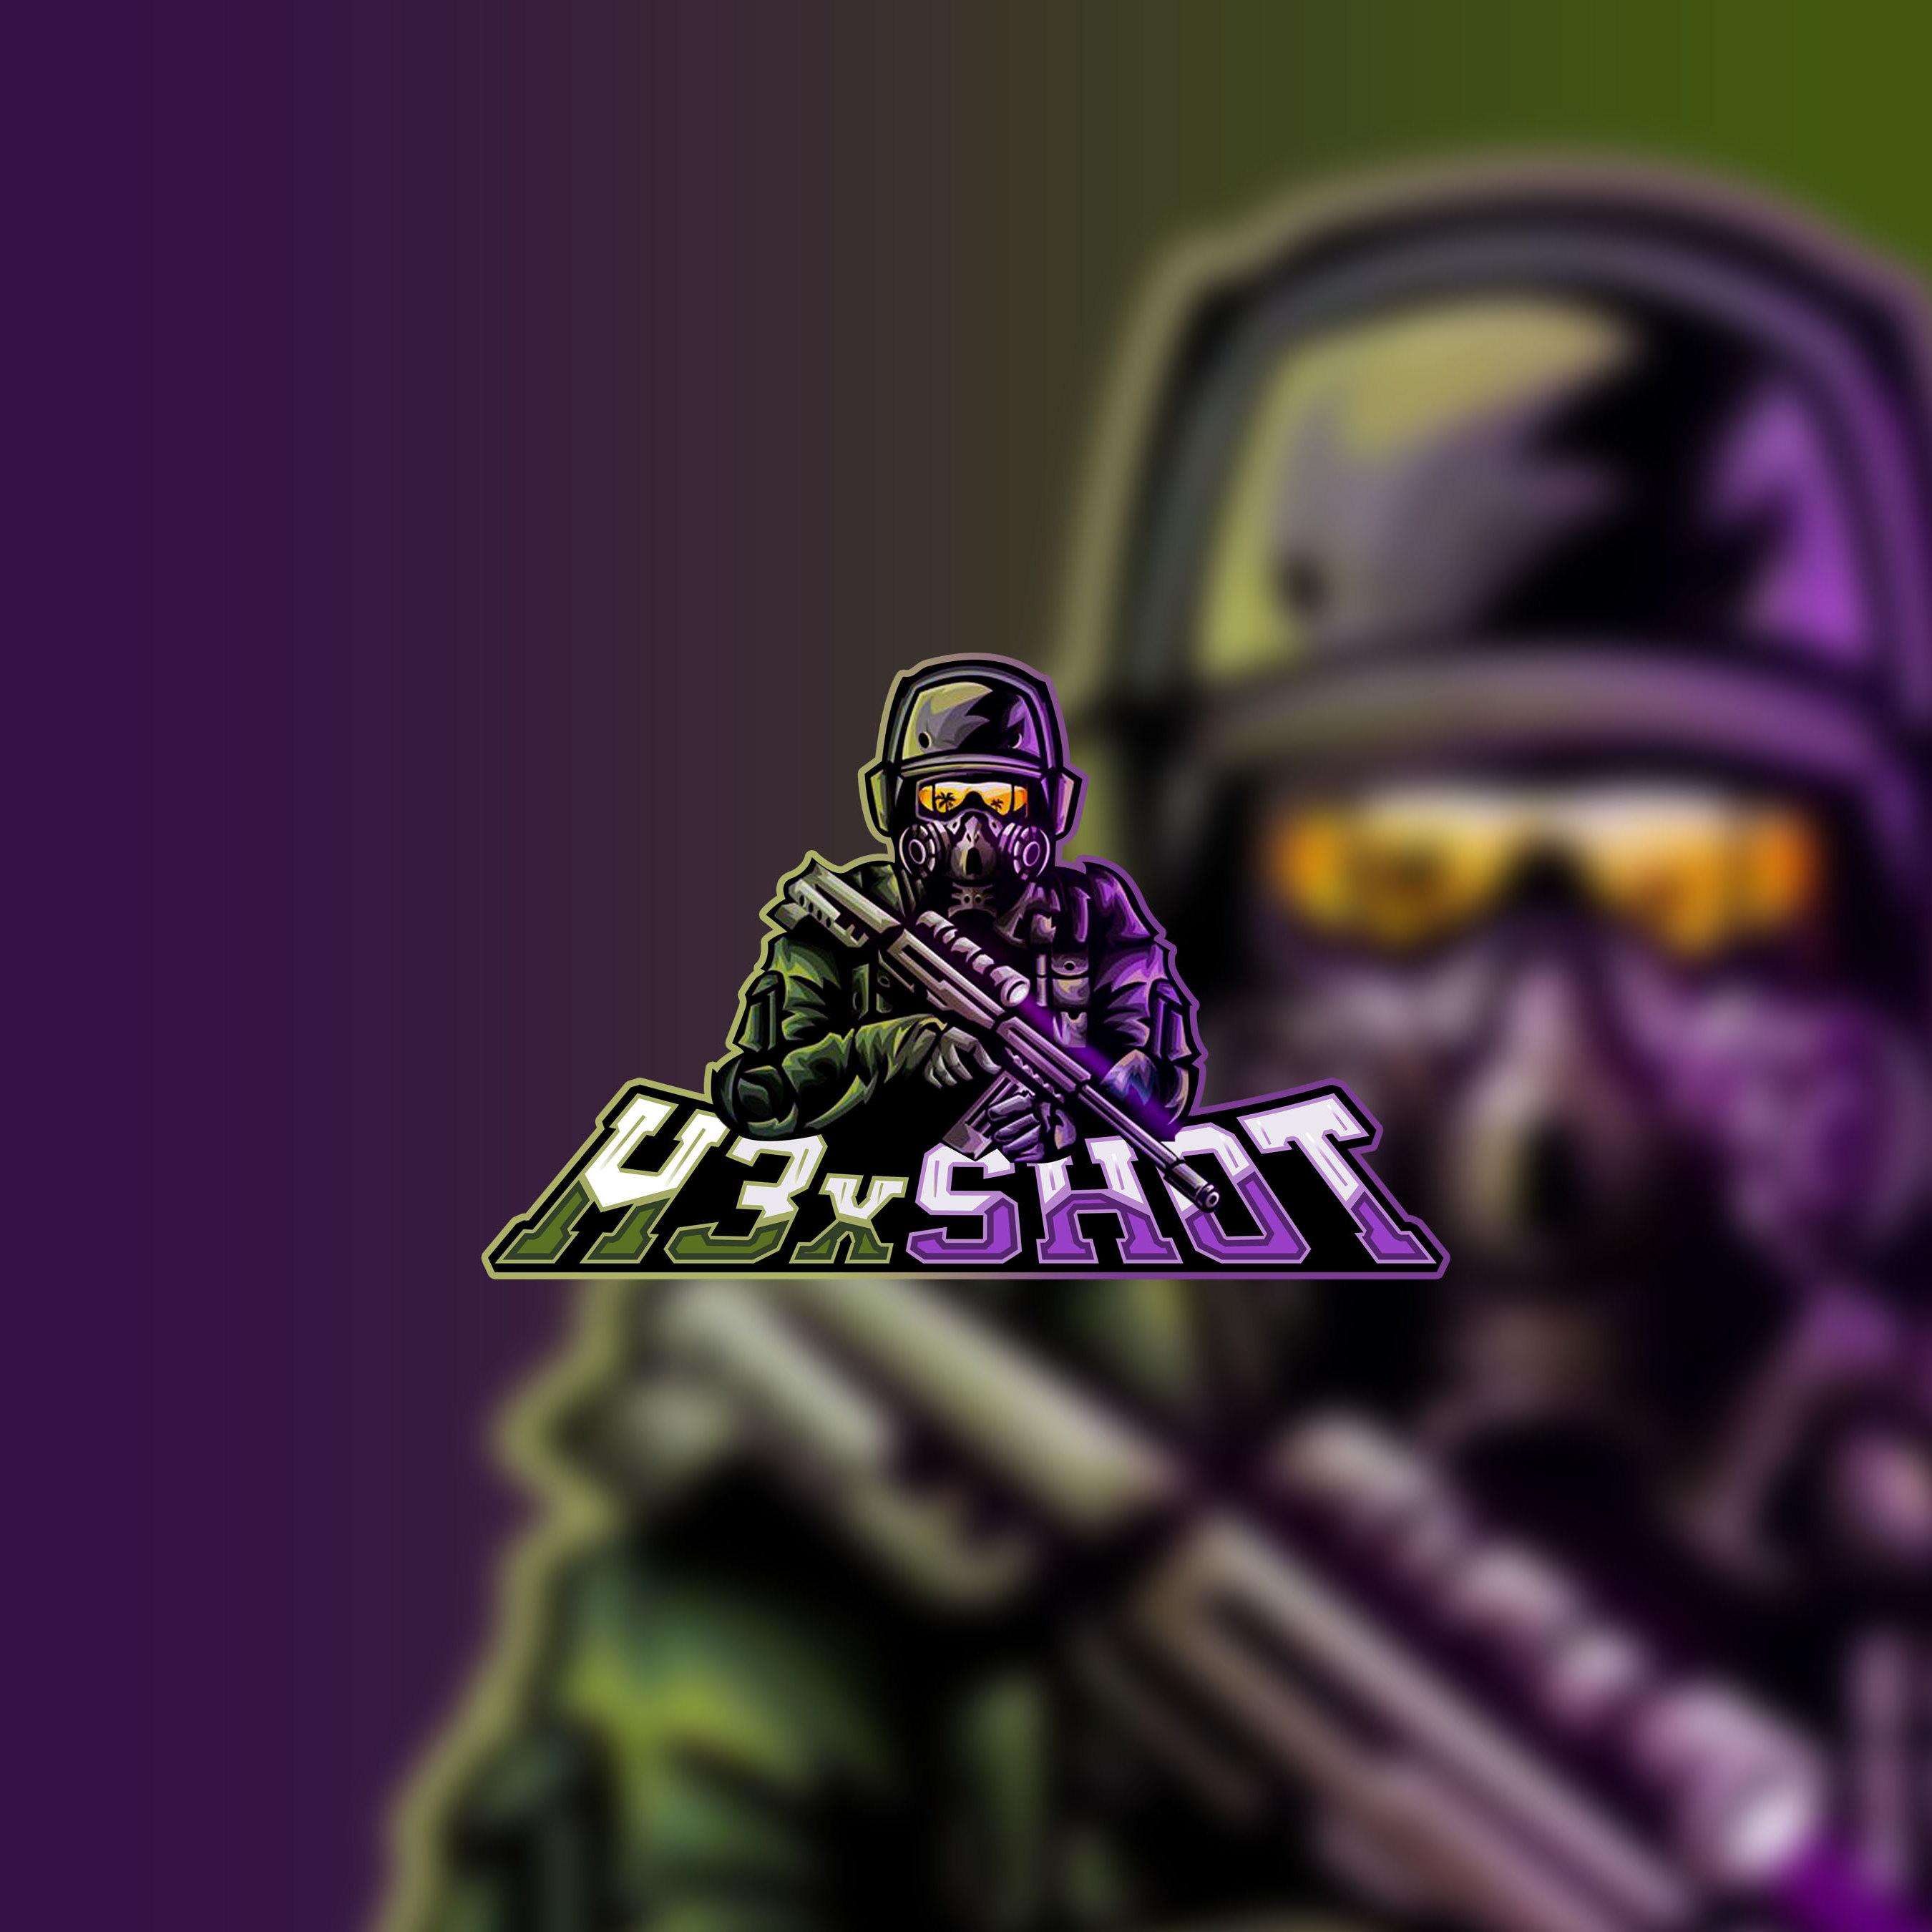 H3xShot profile picture